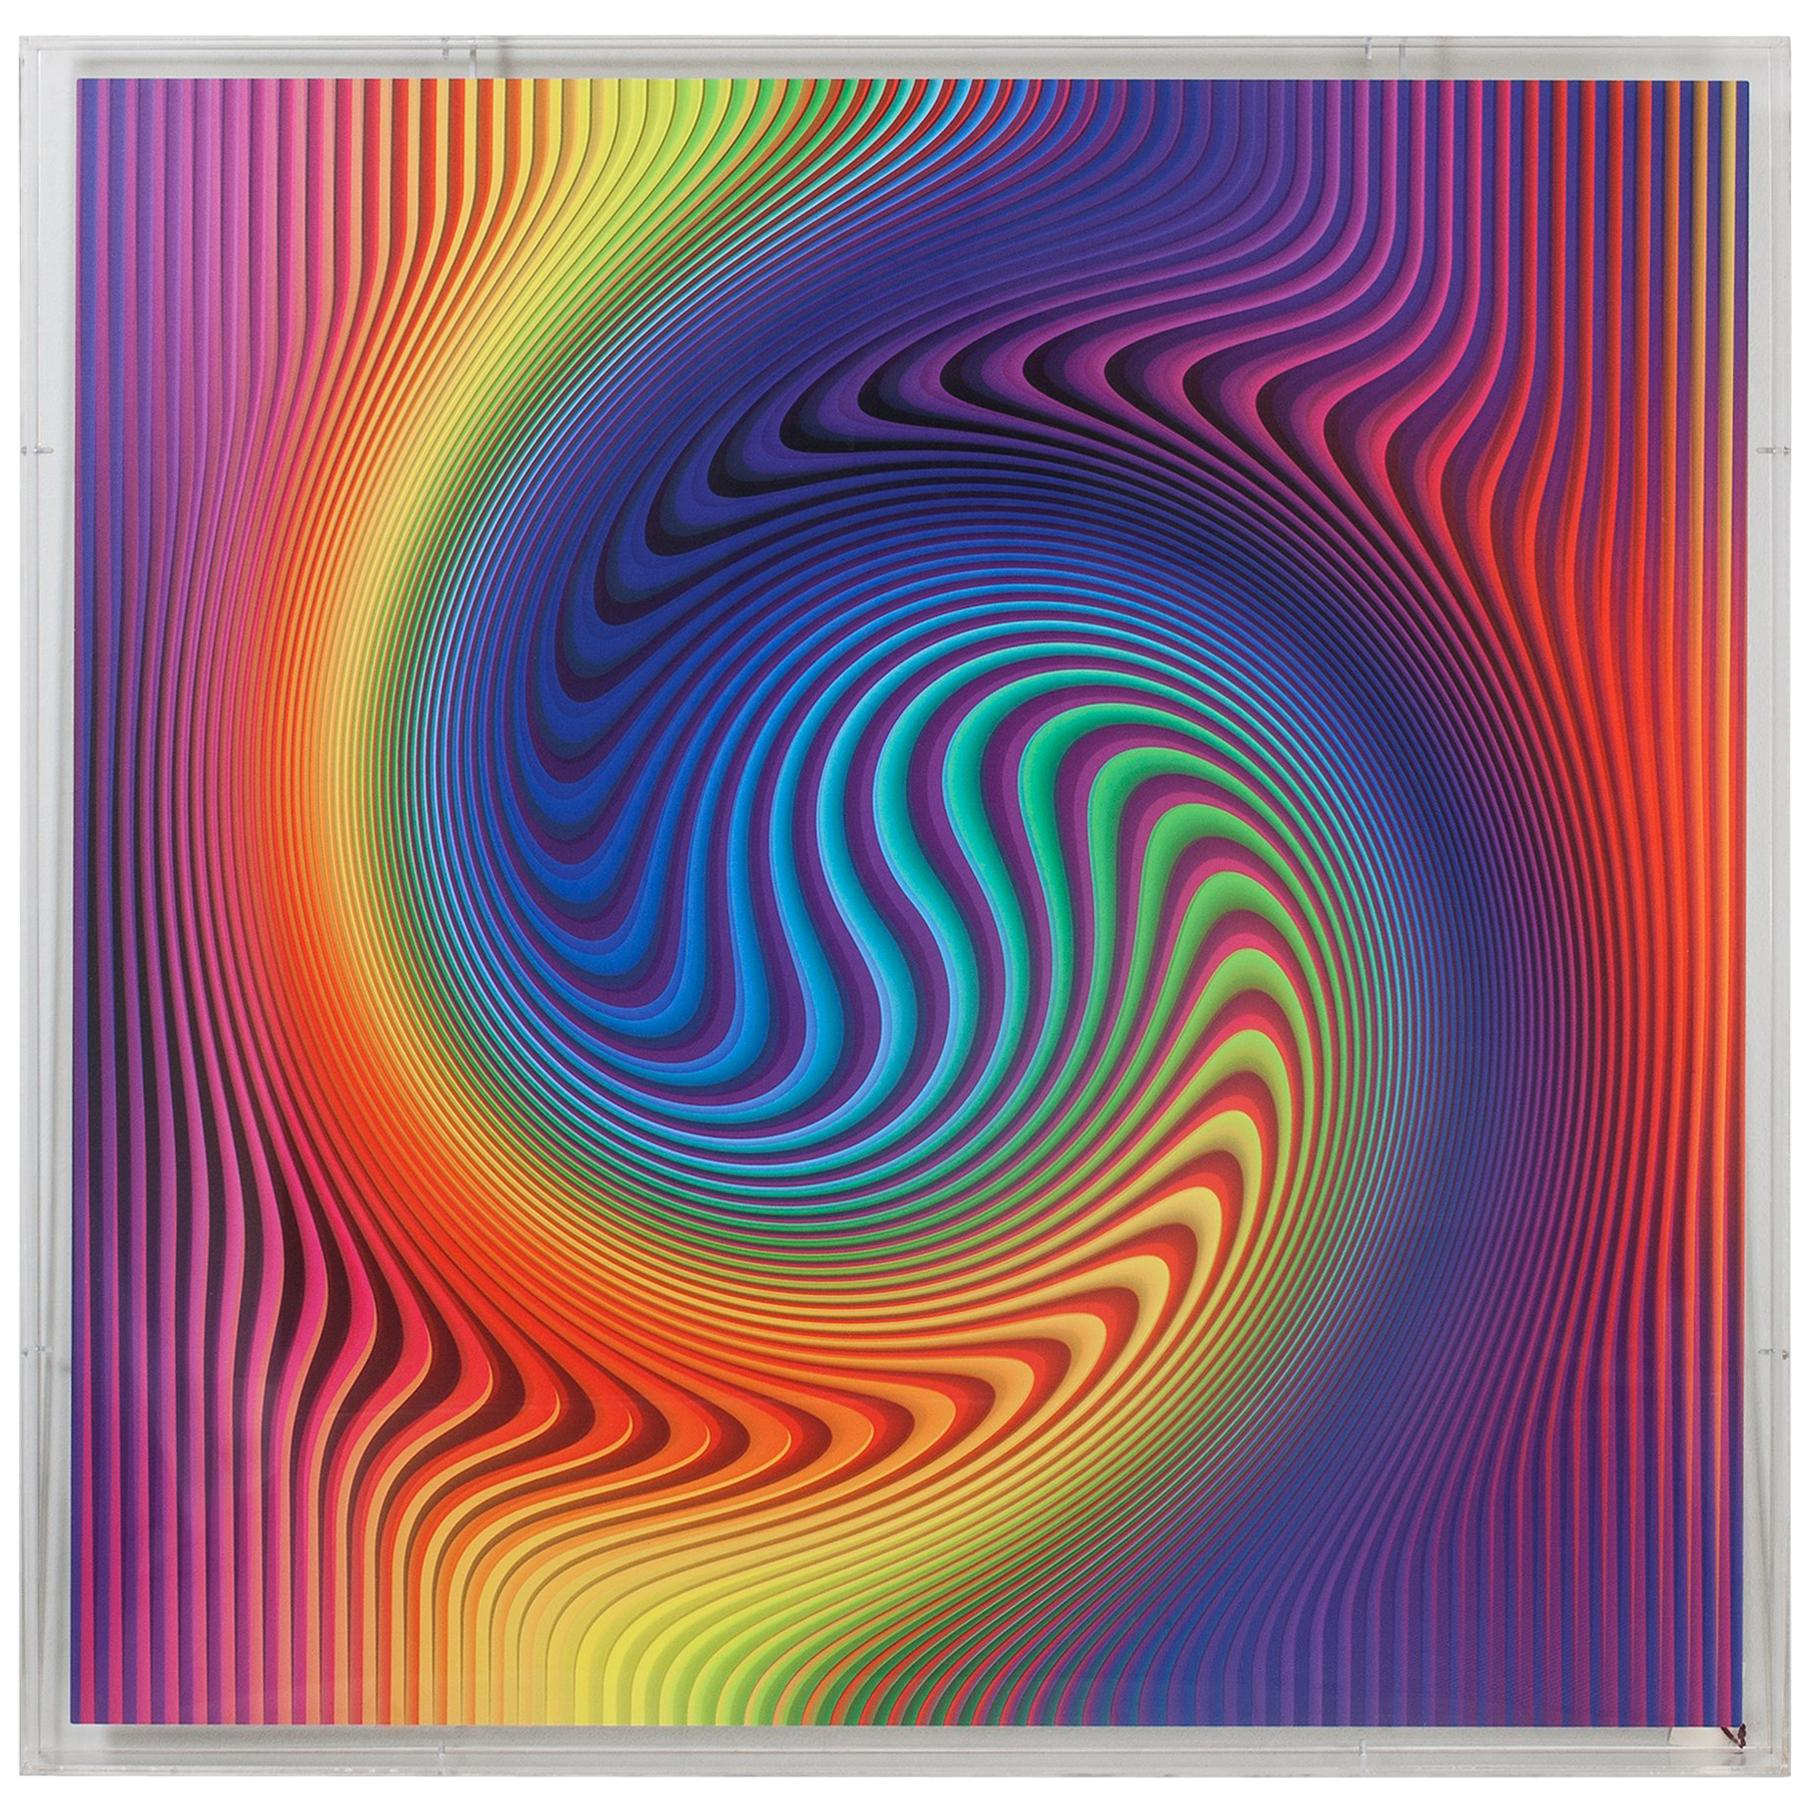 Yanel Sánchez 2015 Optical Art, Digital Print on Aluminum